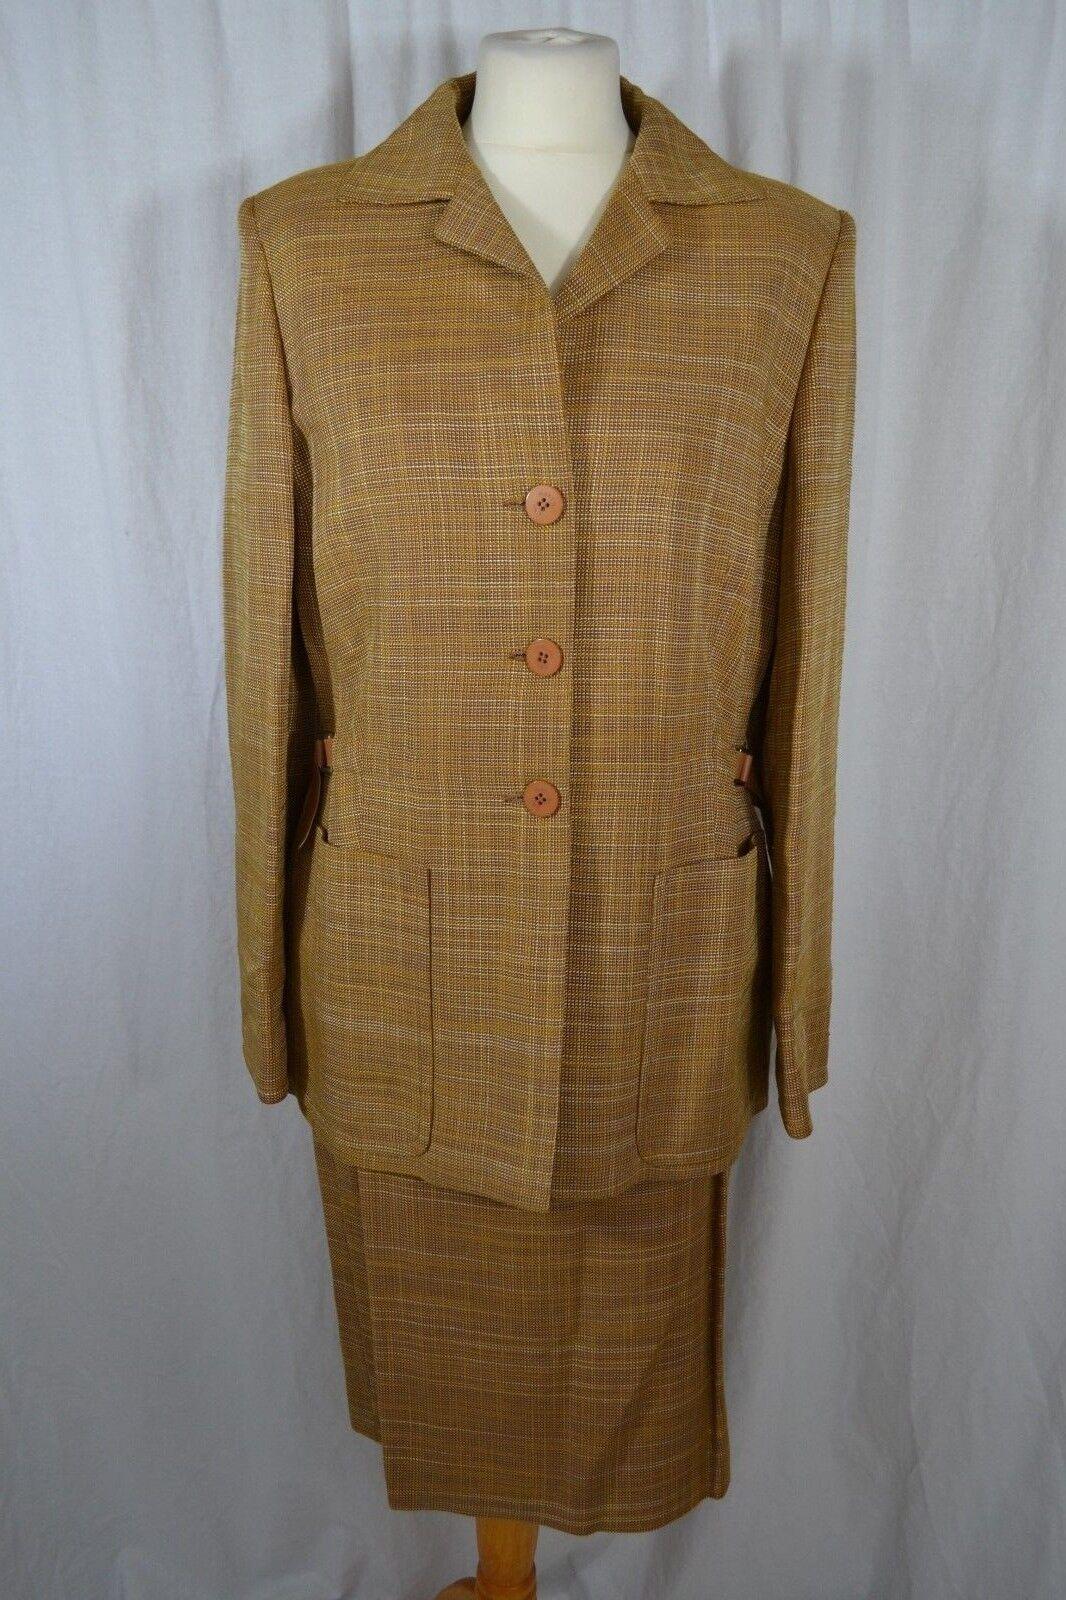 Margon Gelb moutarde Jupe Costume Größe 46 (UK 14) veste + jupe laine soie mélangée